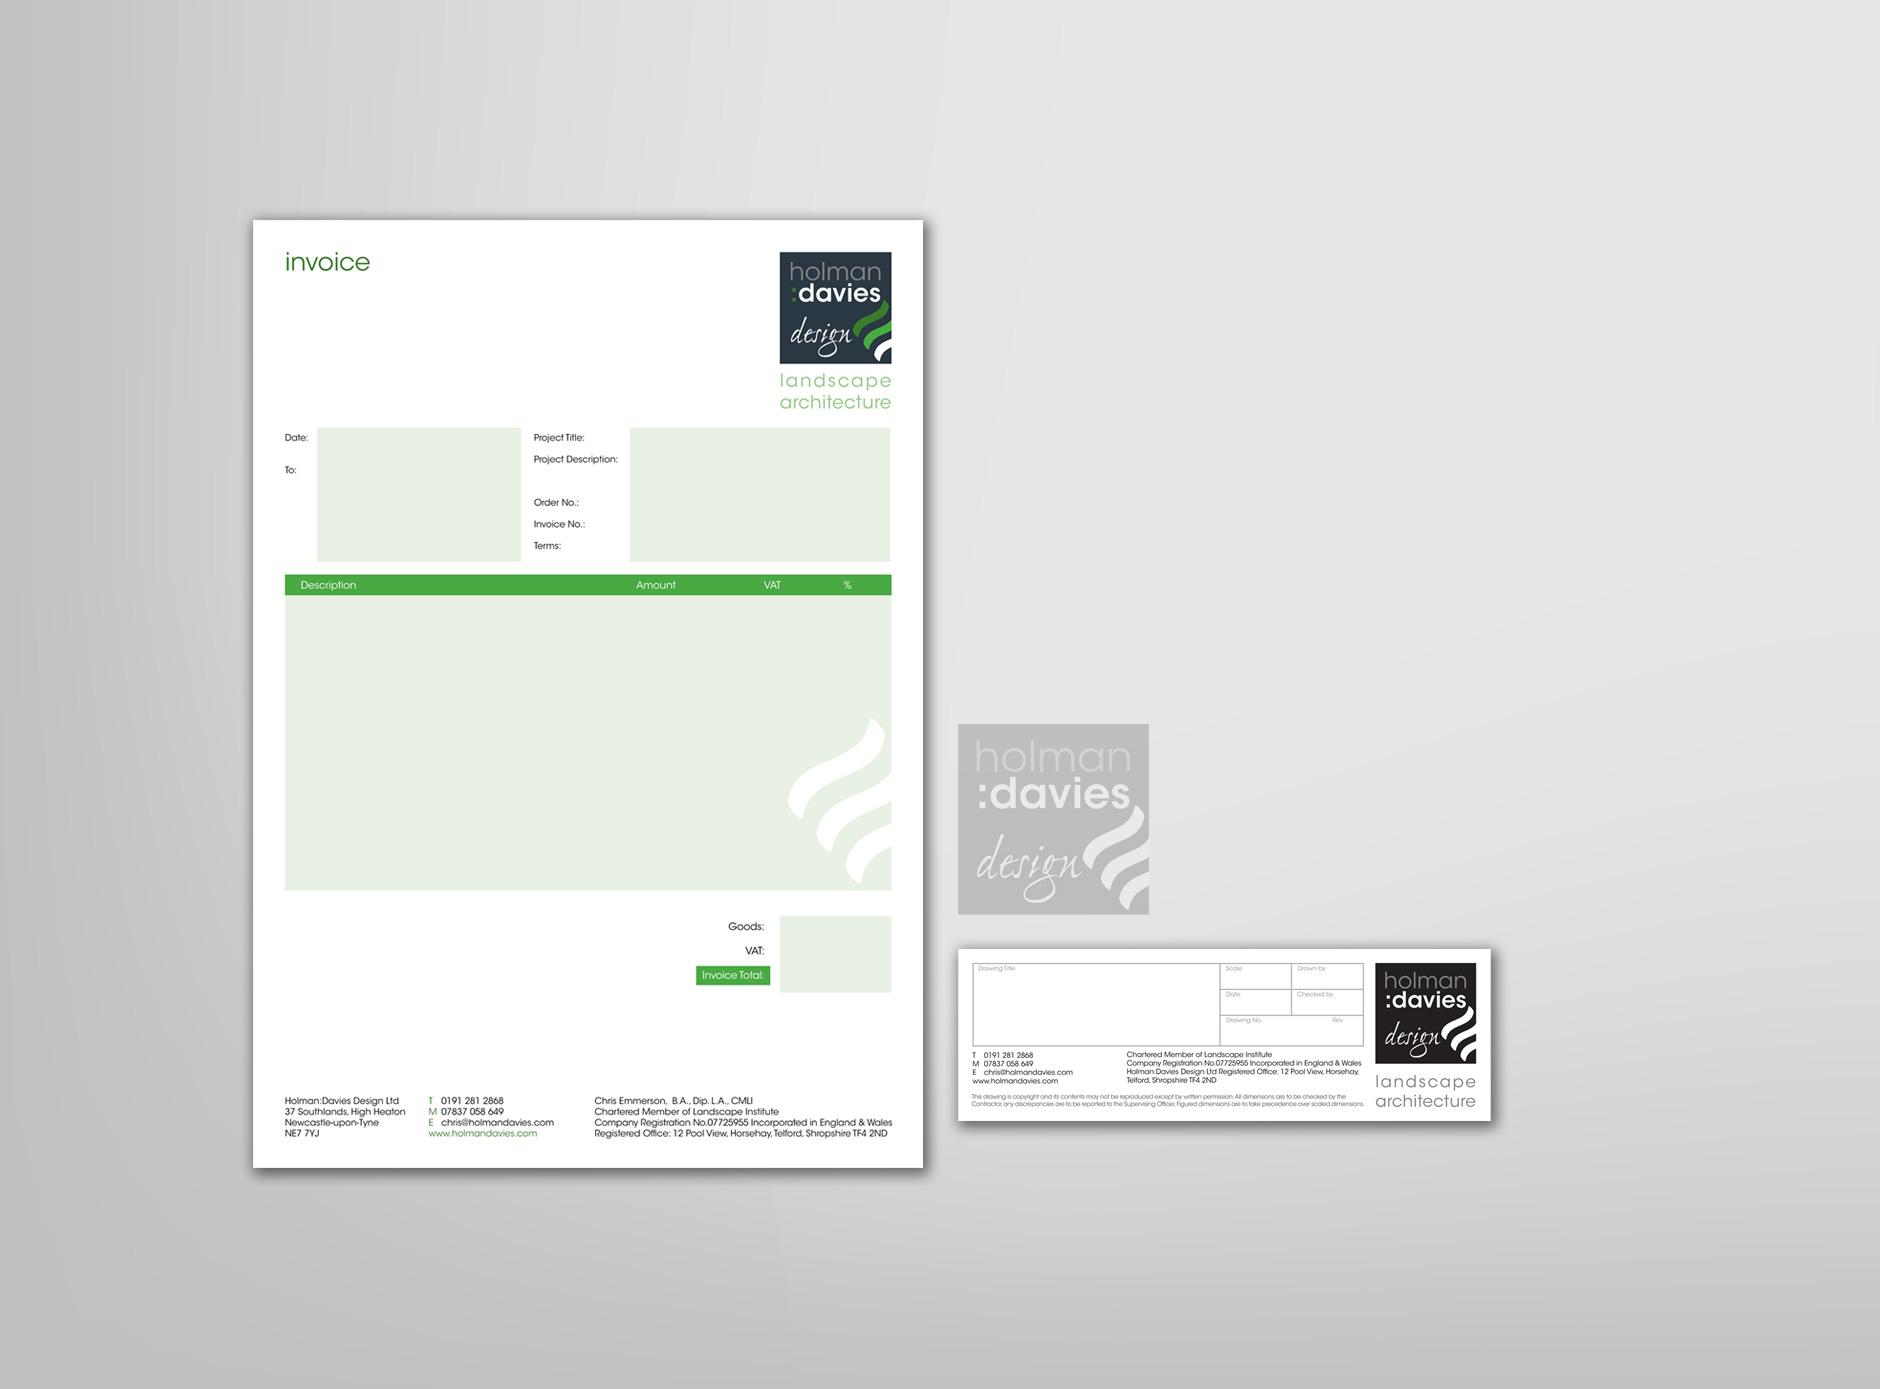 Holman Davies Design identity